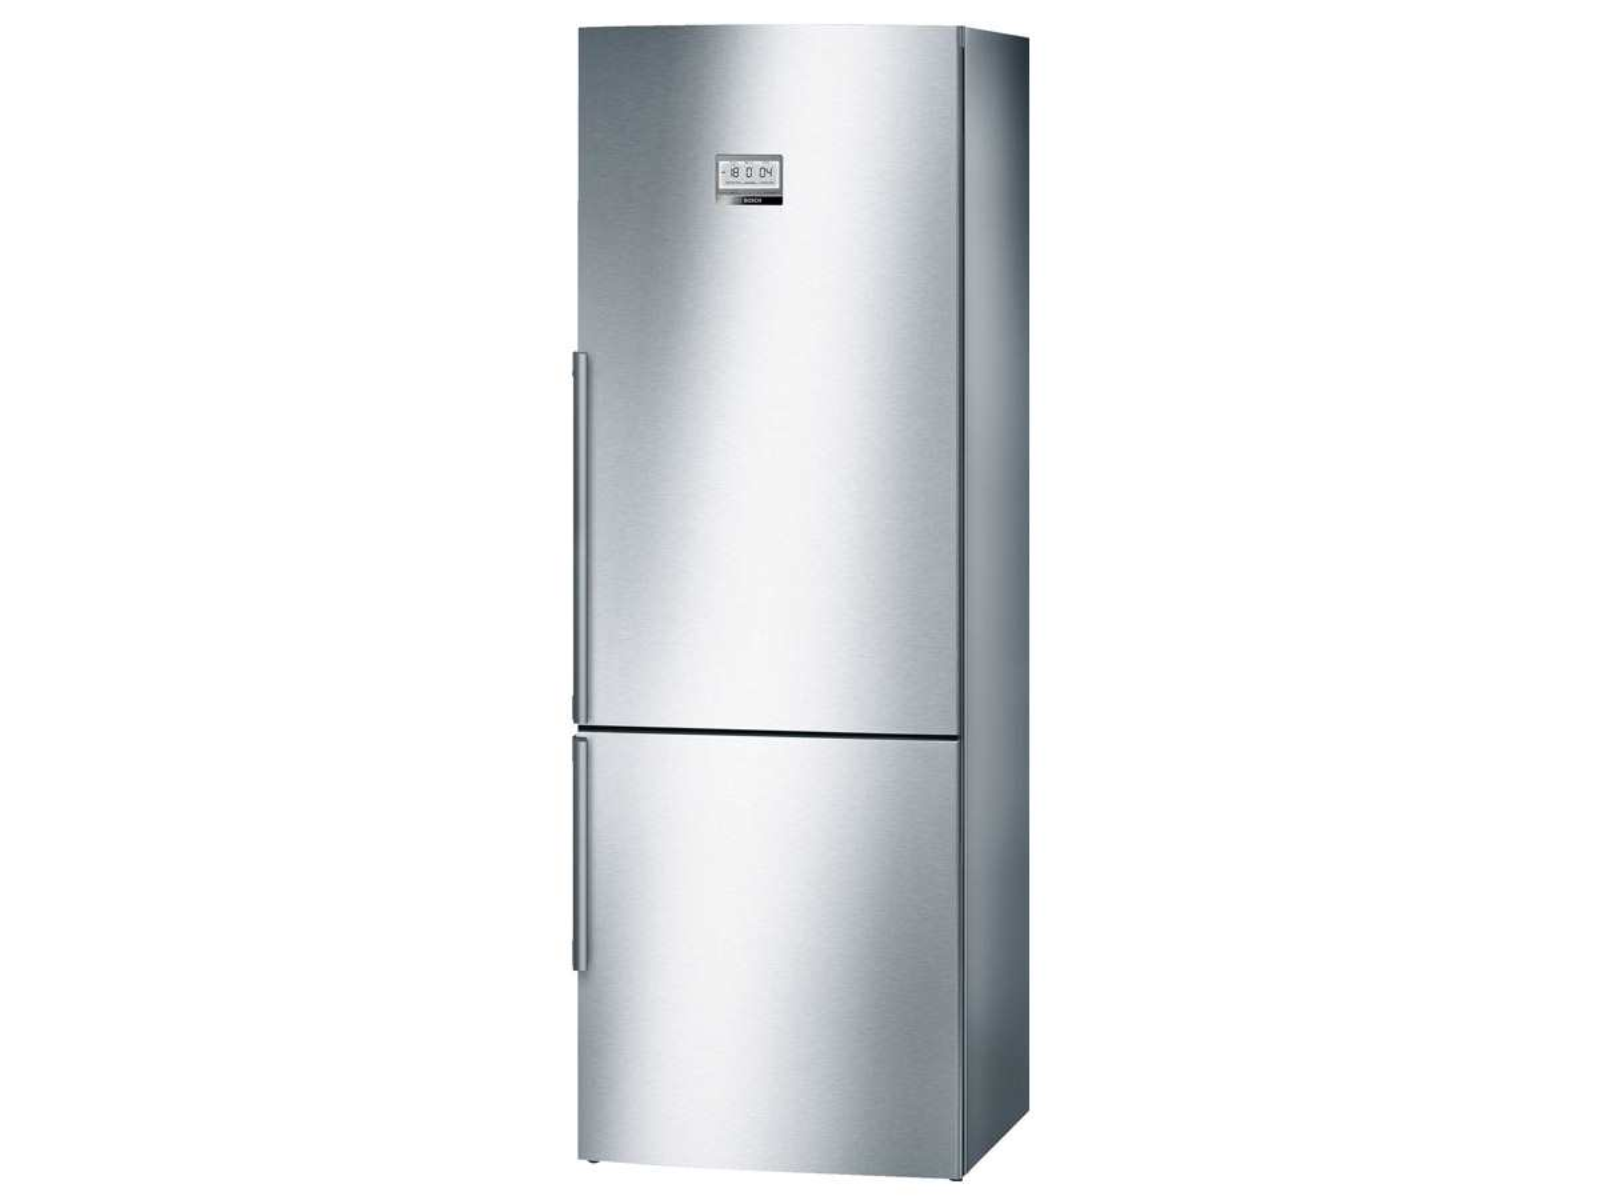 Bosch Kühlschrank 0 Grad Zone : Bosch kgf pi kühl gefrierkombination edelstahl